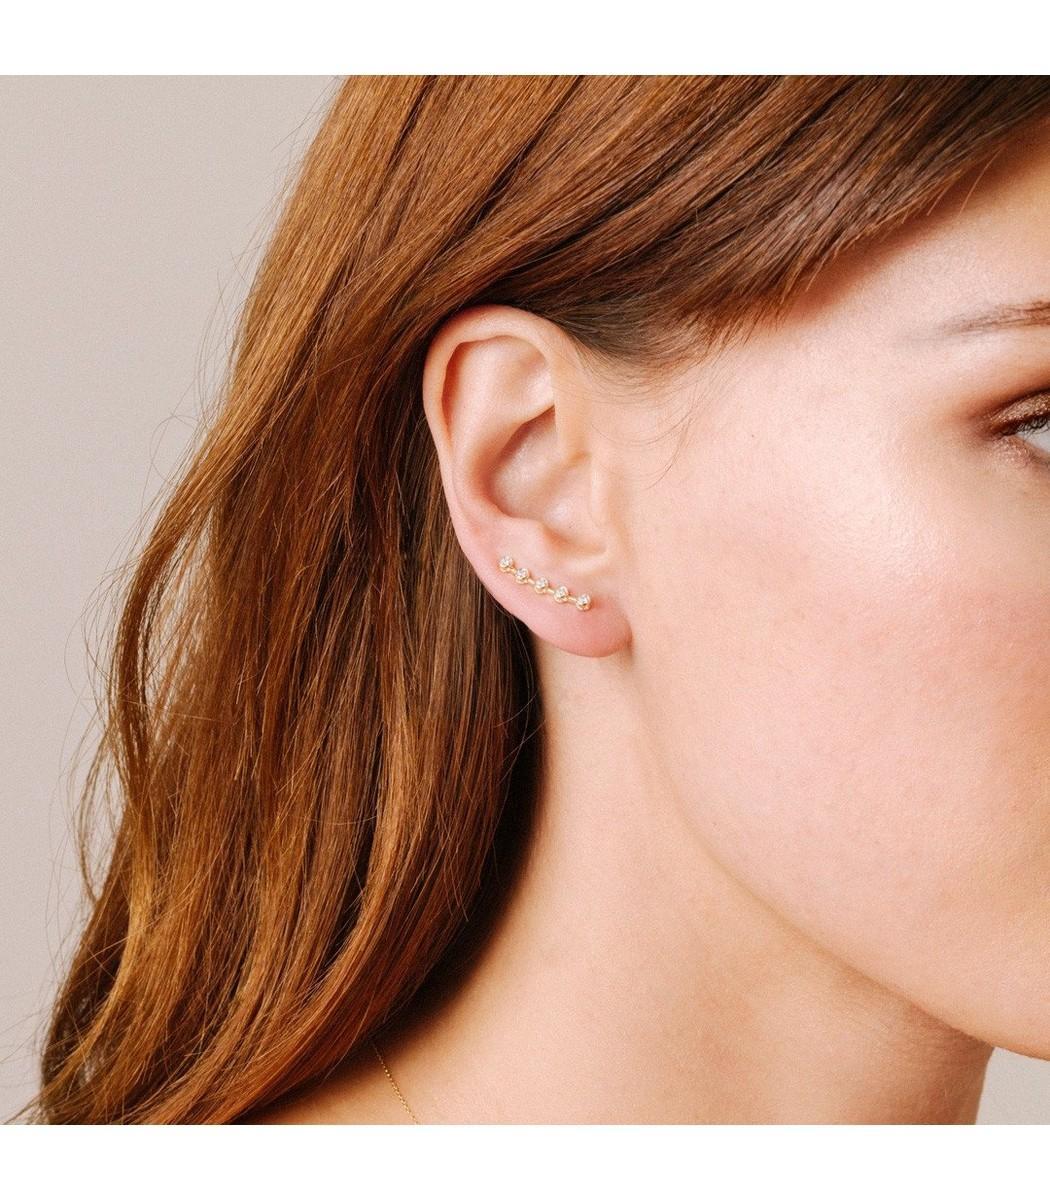 897f17cbb Adina Reyter - Metallic 5 Diamond Wing Earrings In Yellow Gold - Lyst. View  fullscreen